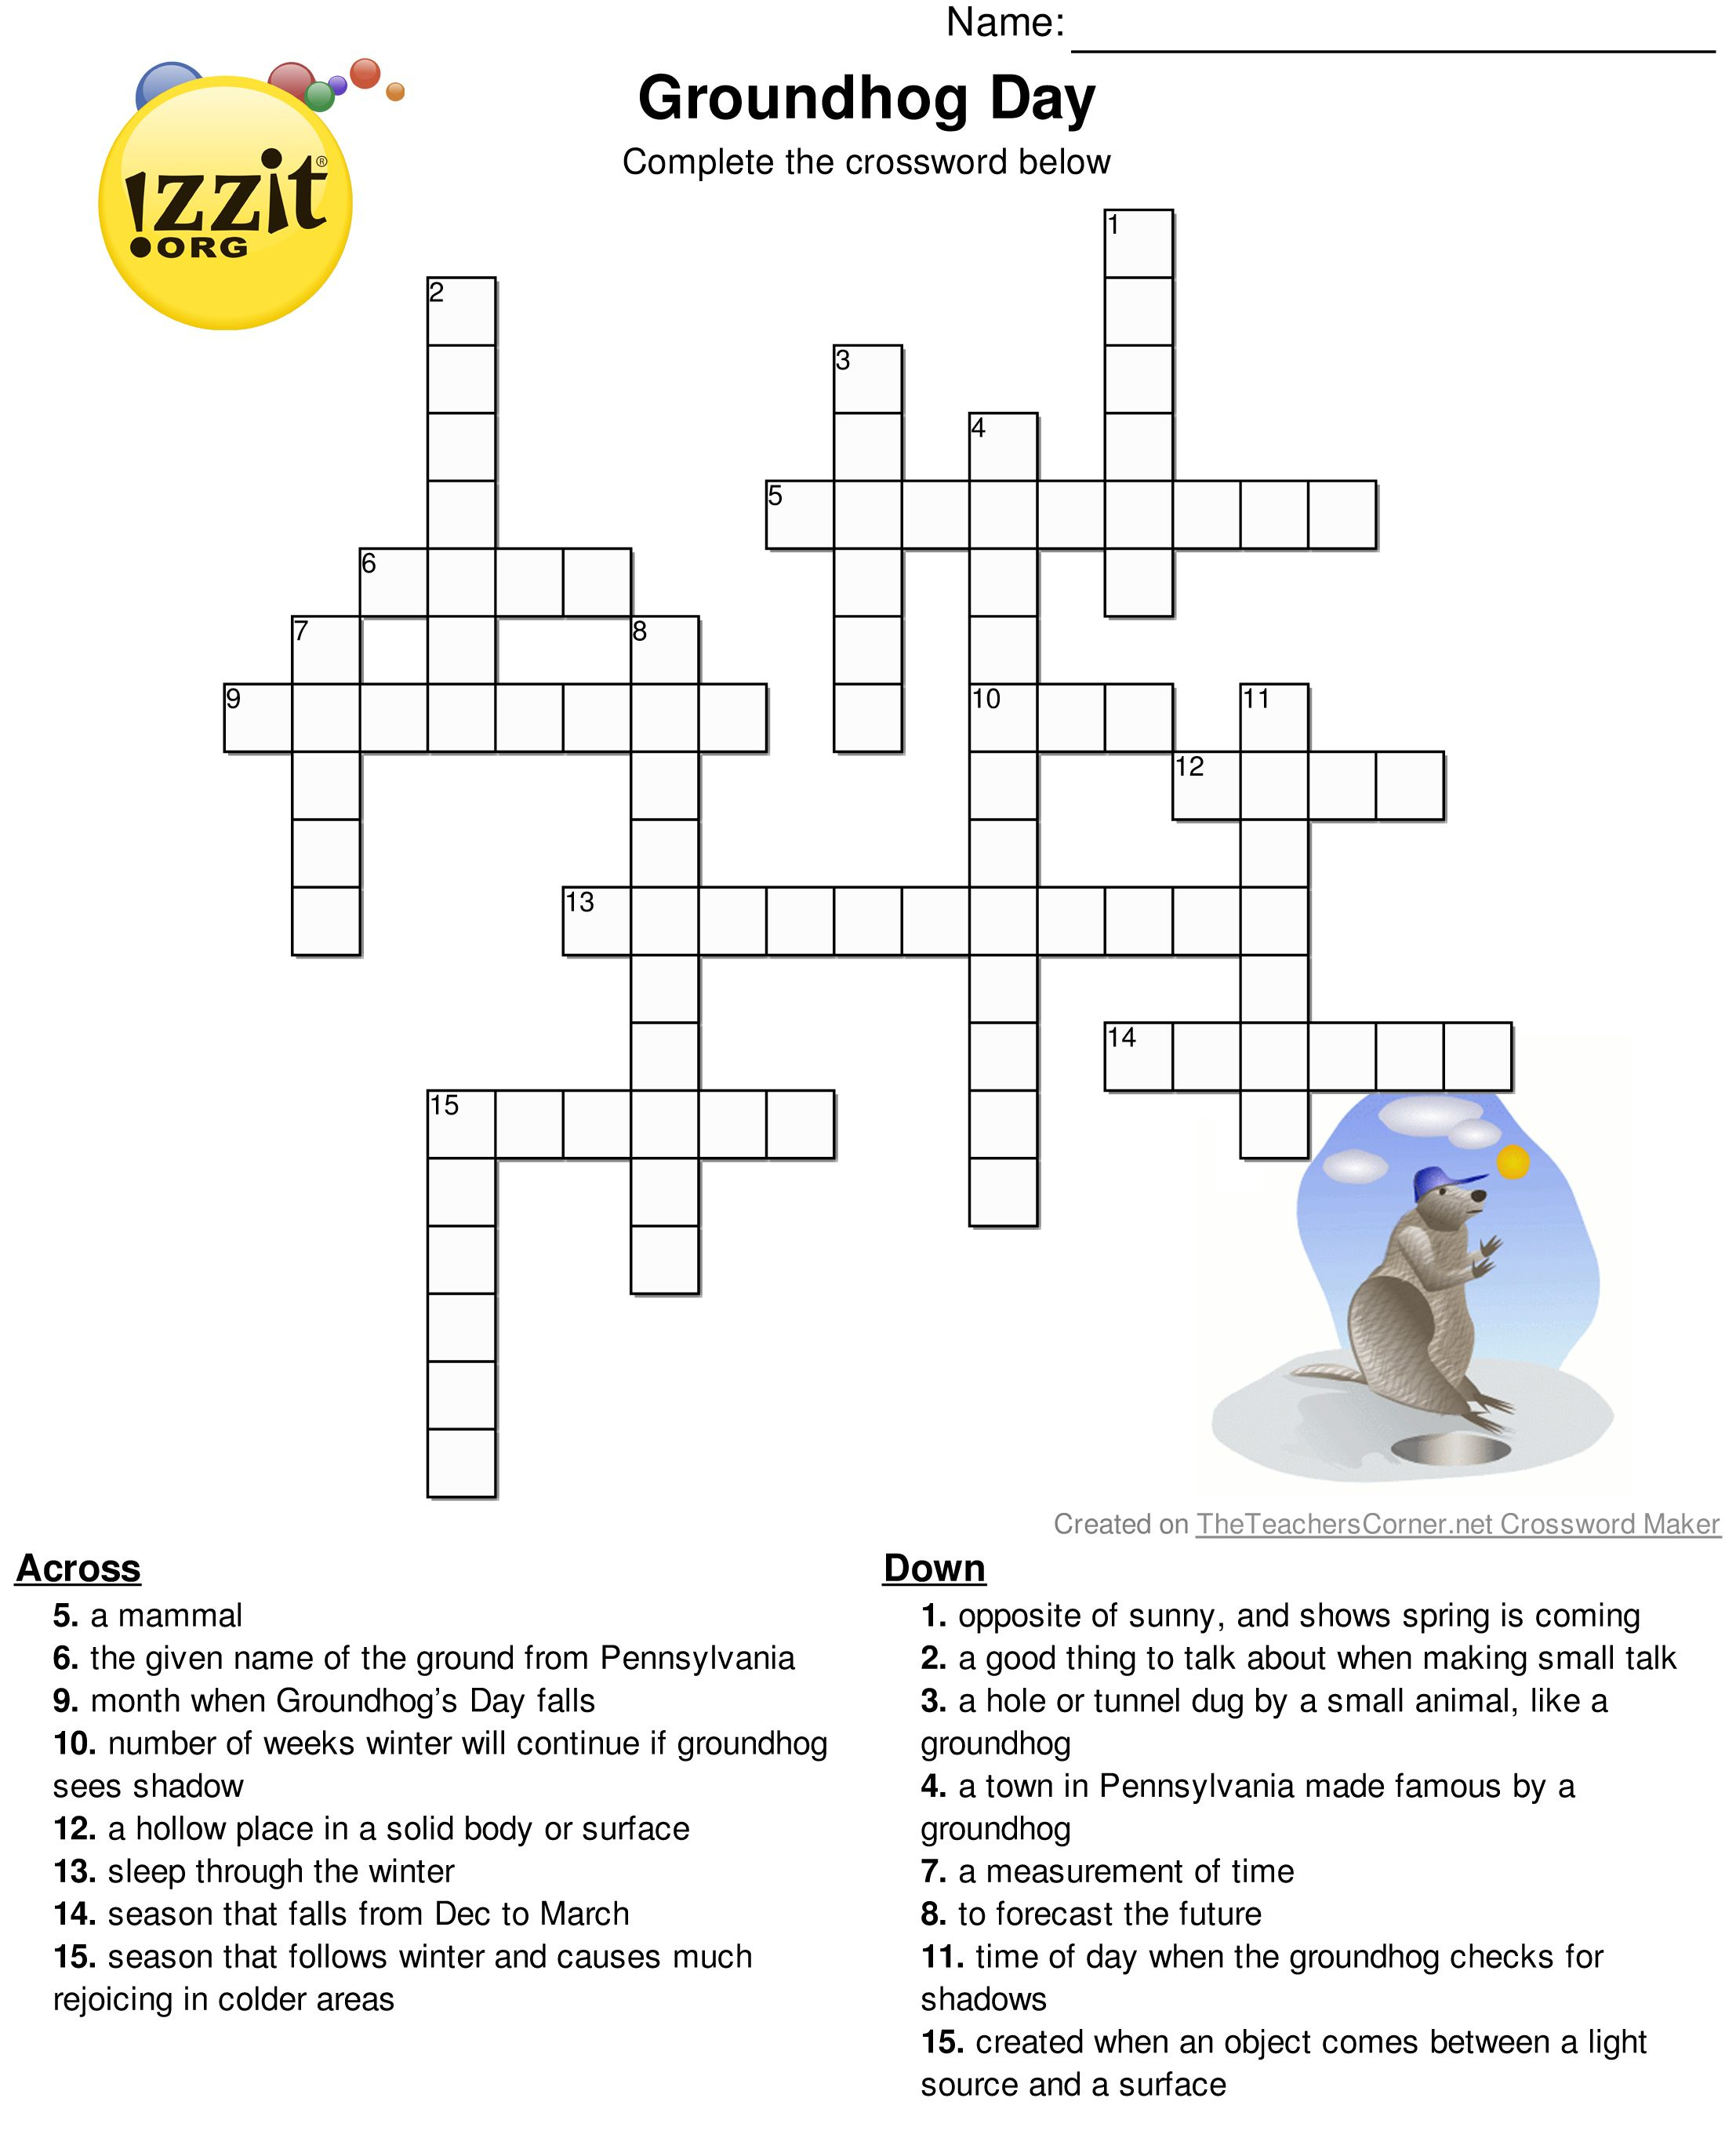 Pinterest - Groundhog Day Crossword Puzzles Printable